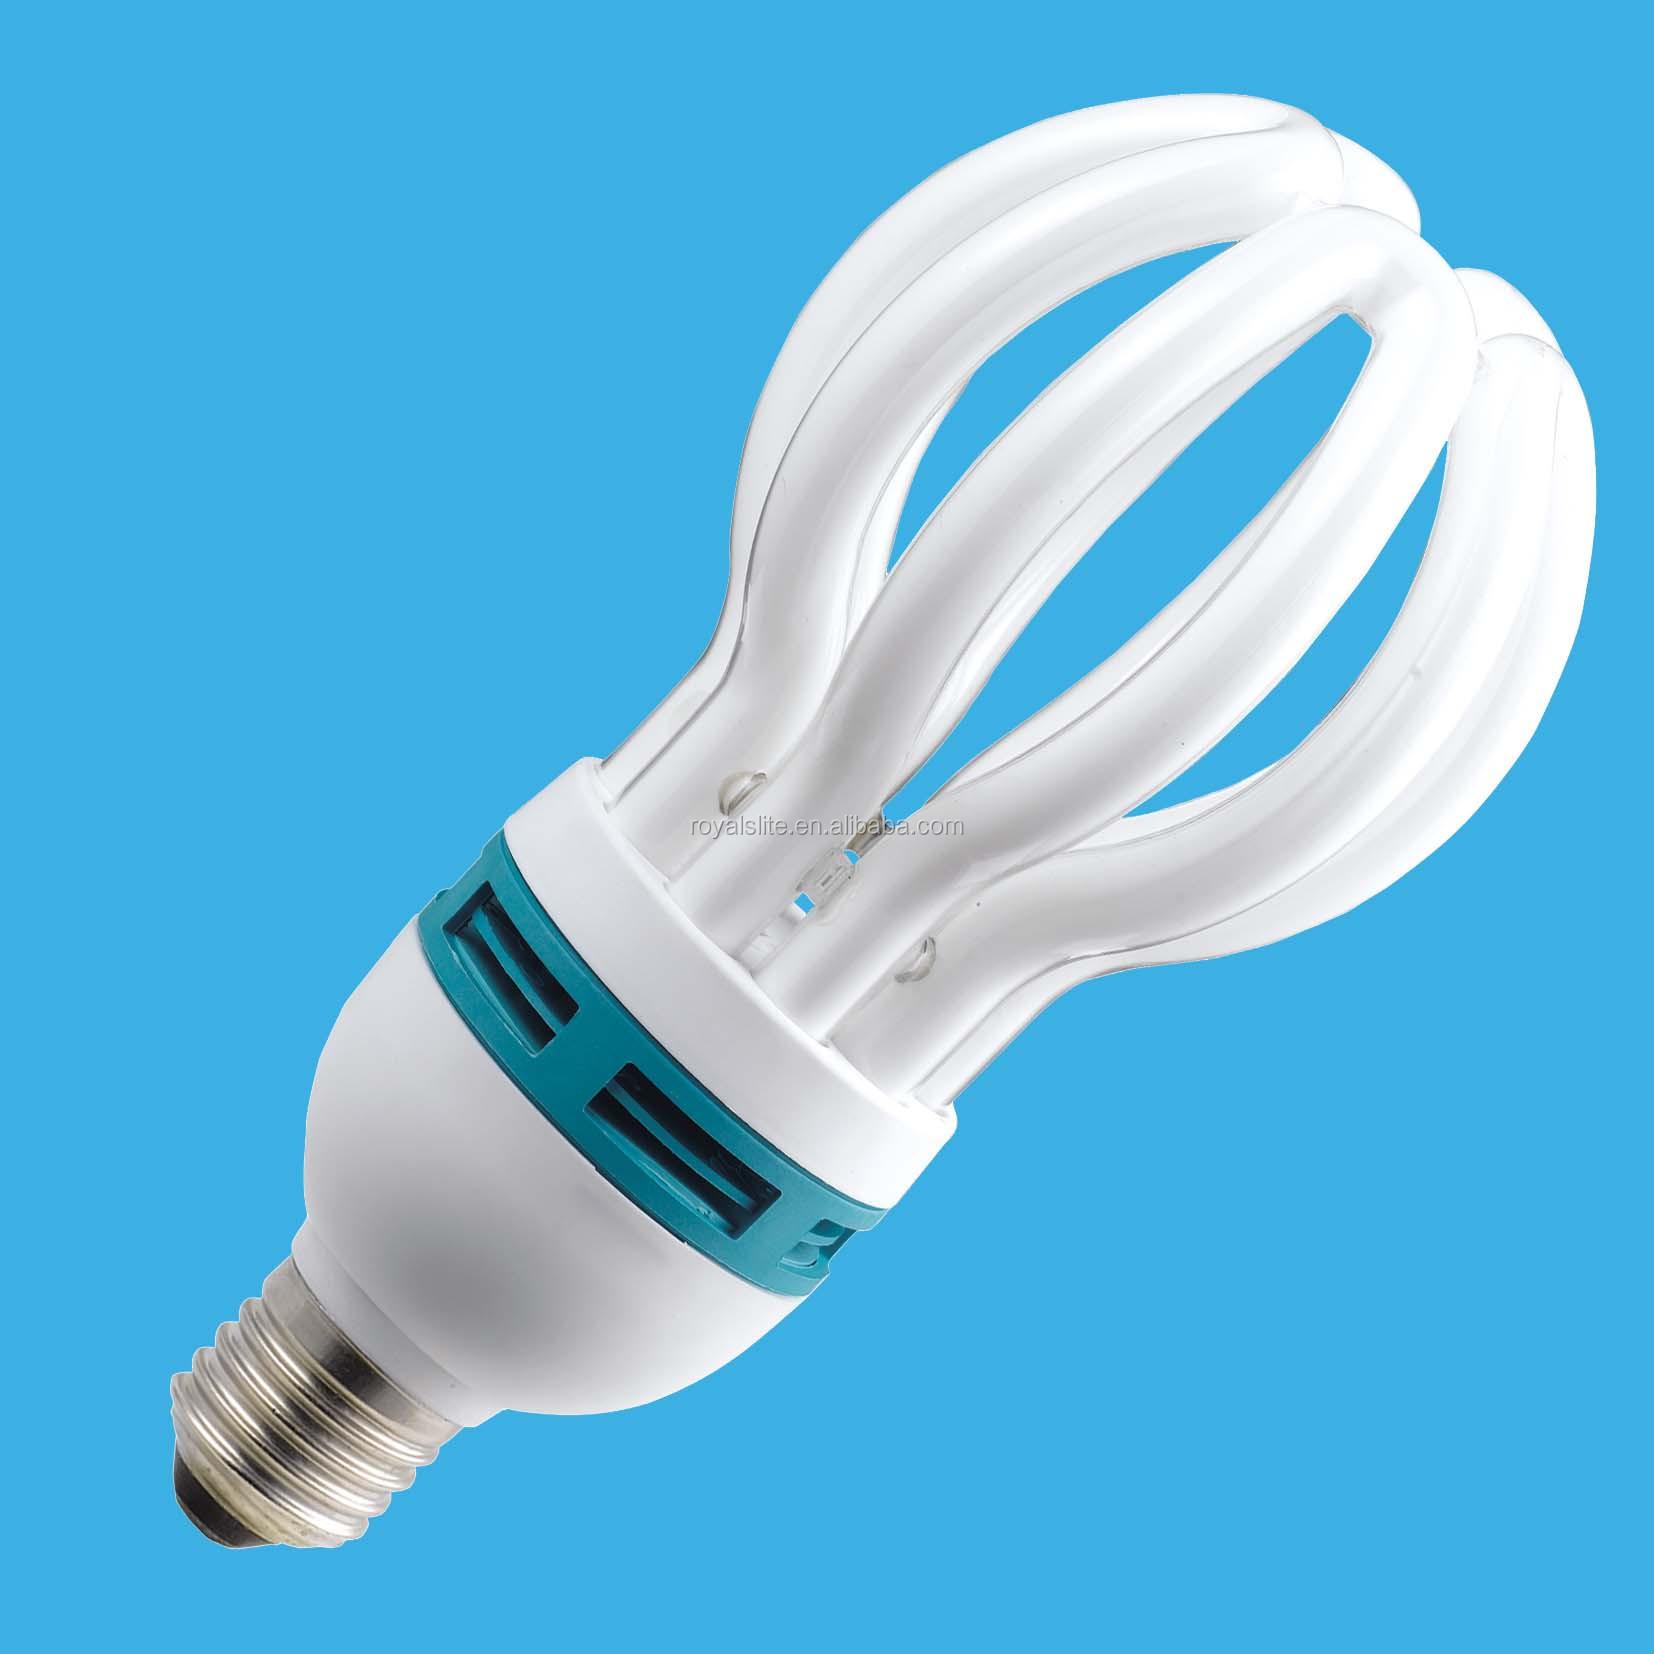 High Power Lotus Energy Saving Lamp 105w - Buy Energy Saving Lamp ...